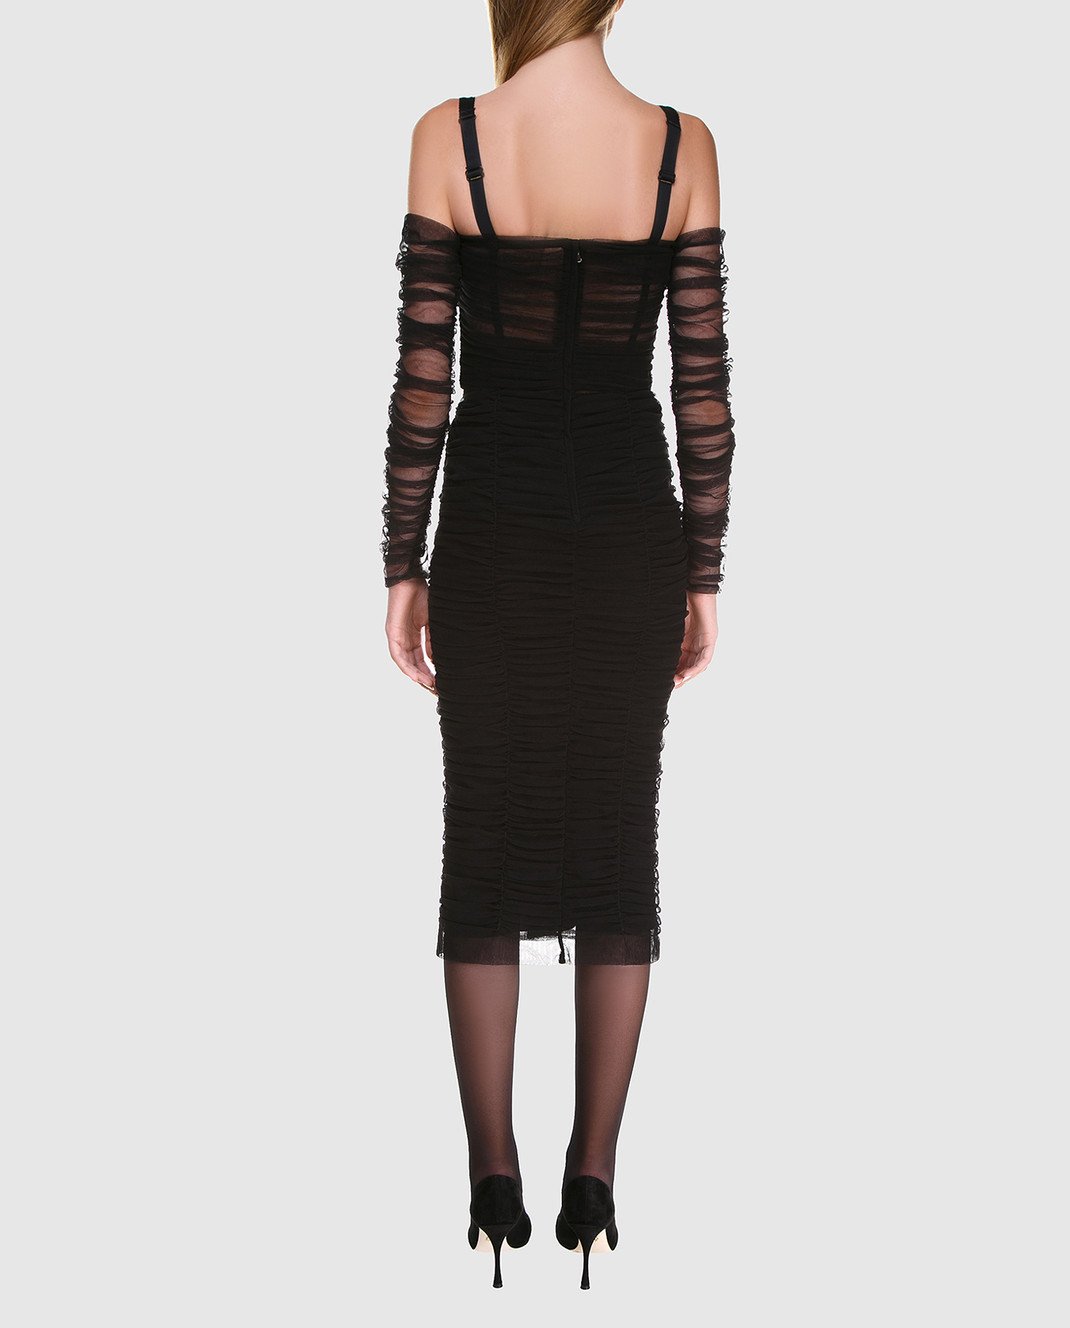 Dolce&Gabbana Черное платье F6A9QTFLEAA изображение 4